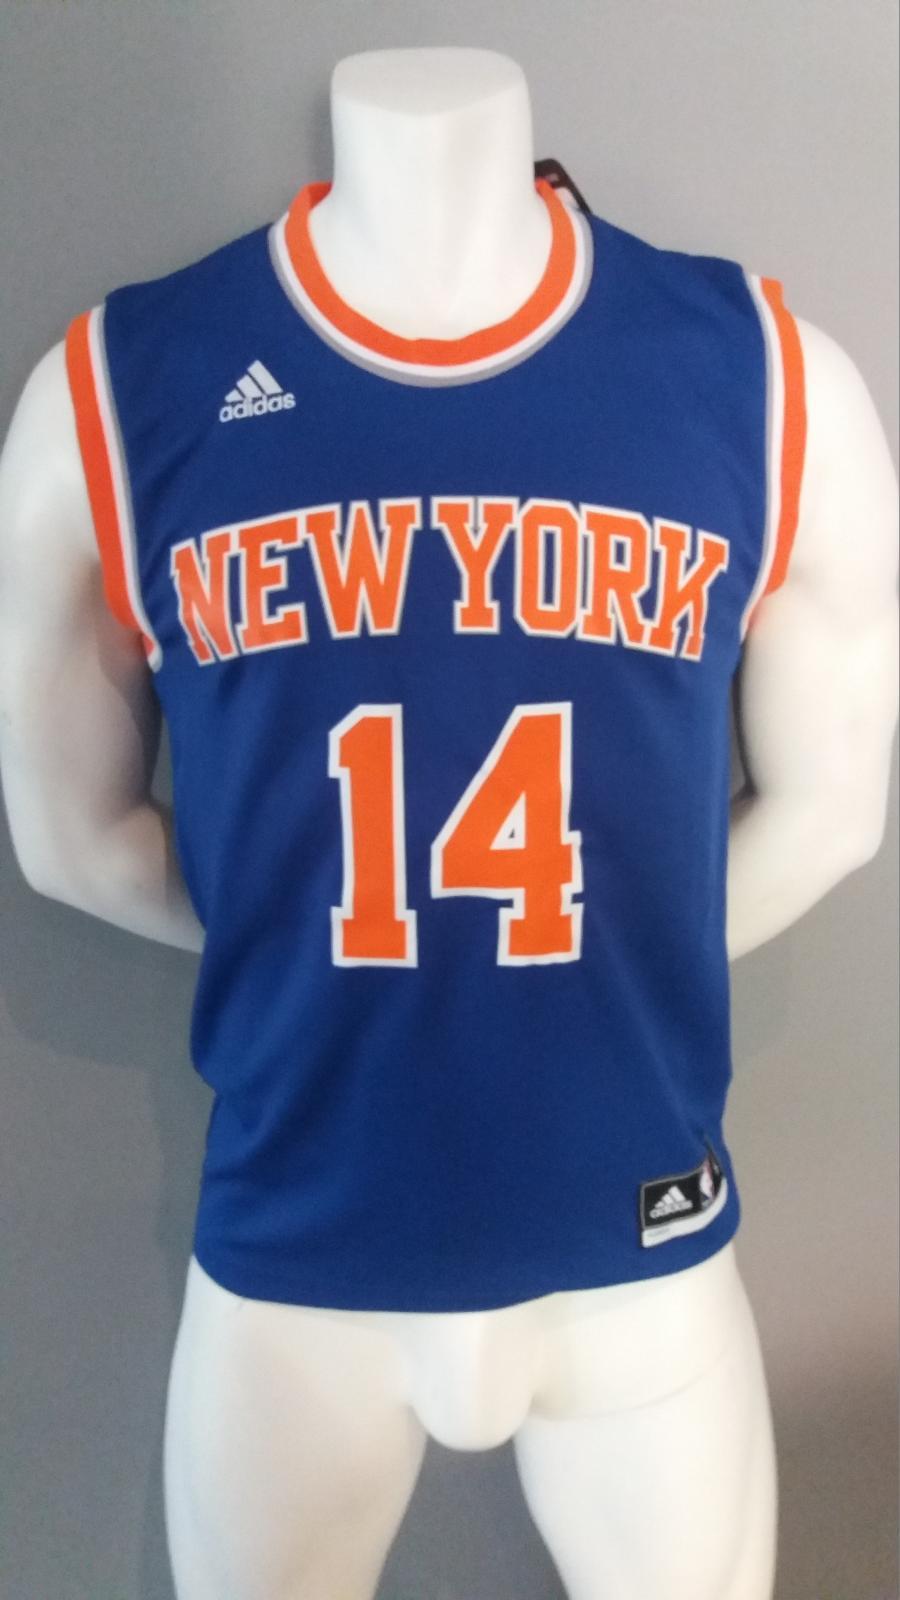 Jersey - Replica - Hombre - Willy Hernangomez - New York Knicks - Road - Adidas